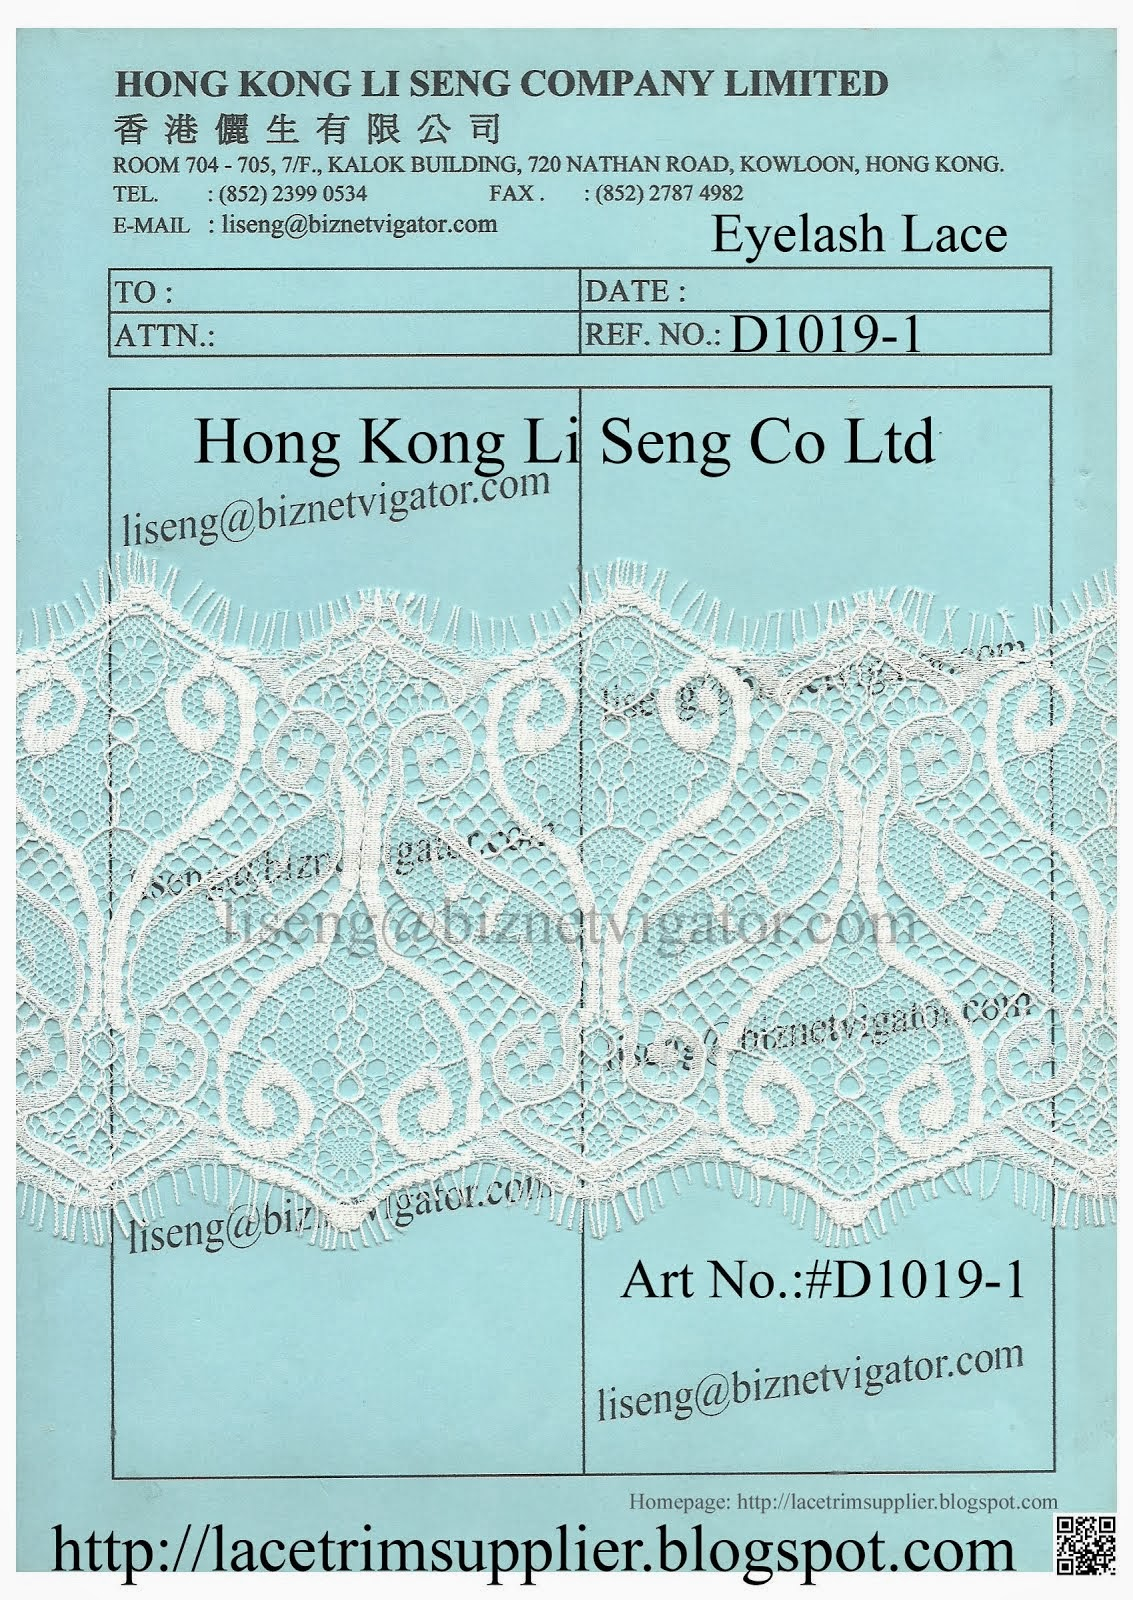 Eyelash Lace Trims Suppliers - Hong Kong Li Seng Co Ltd